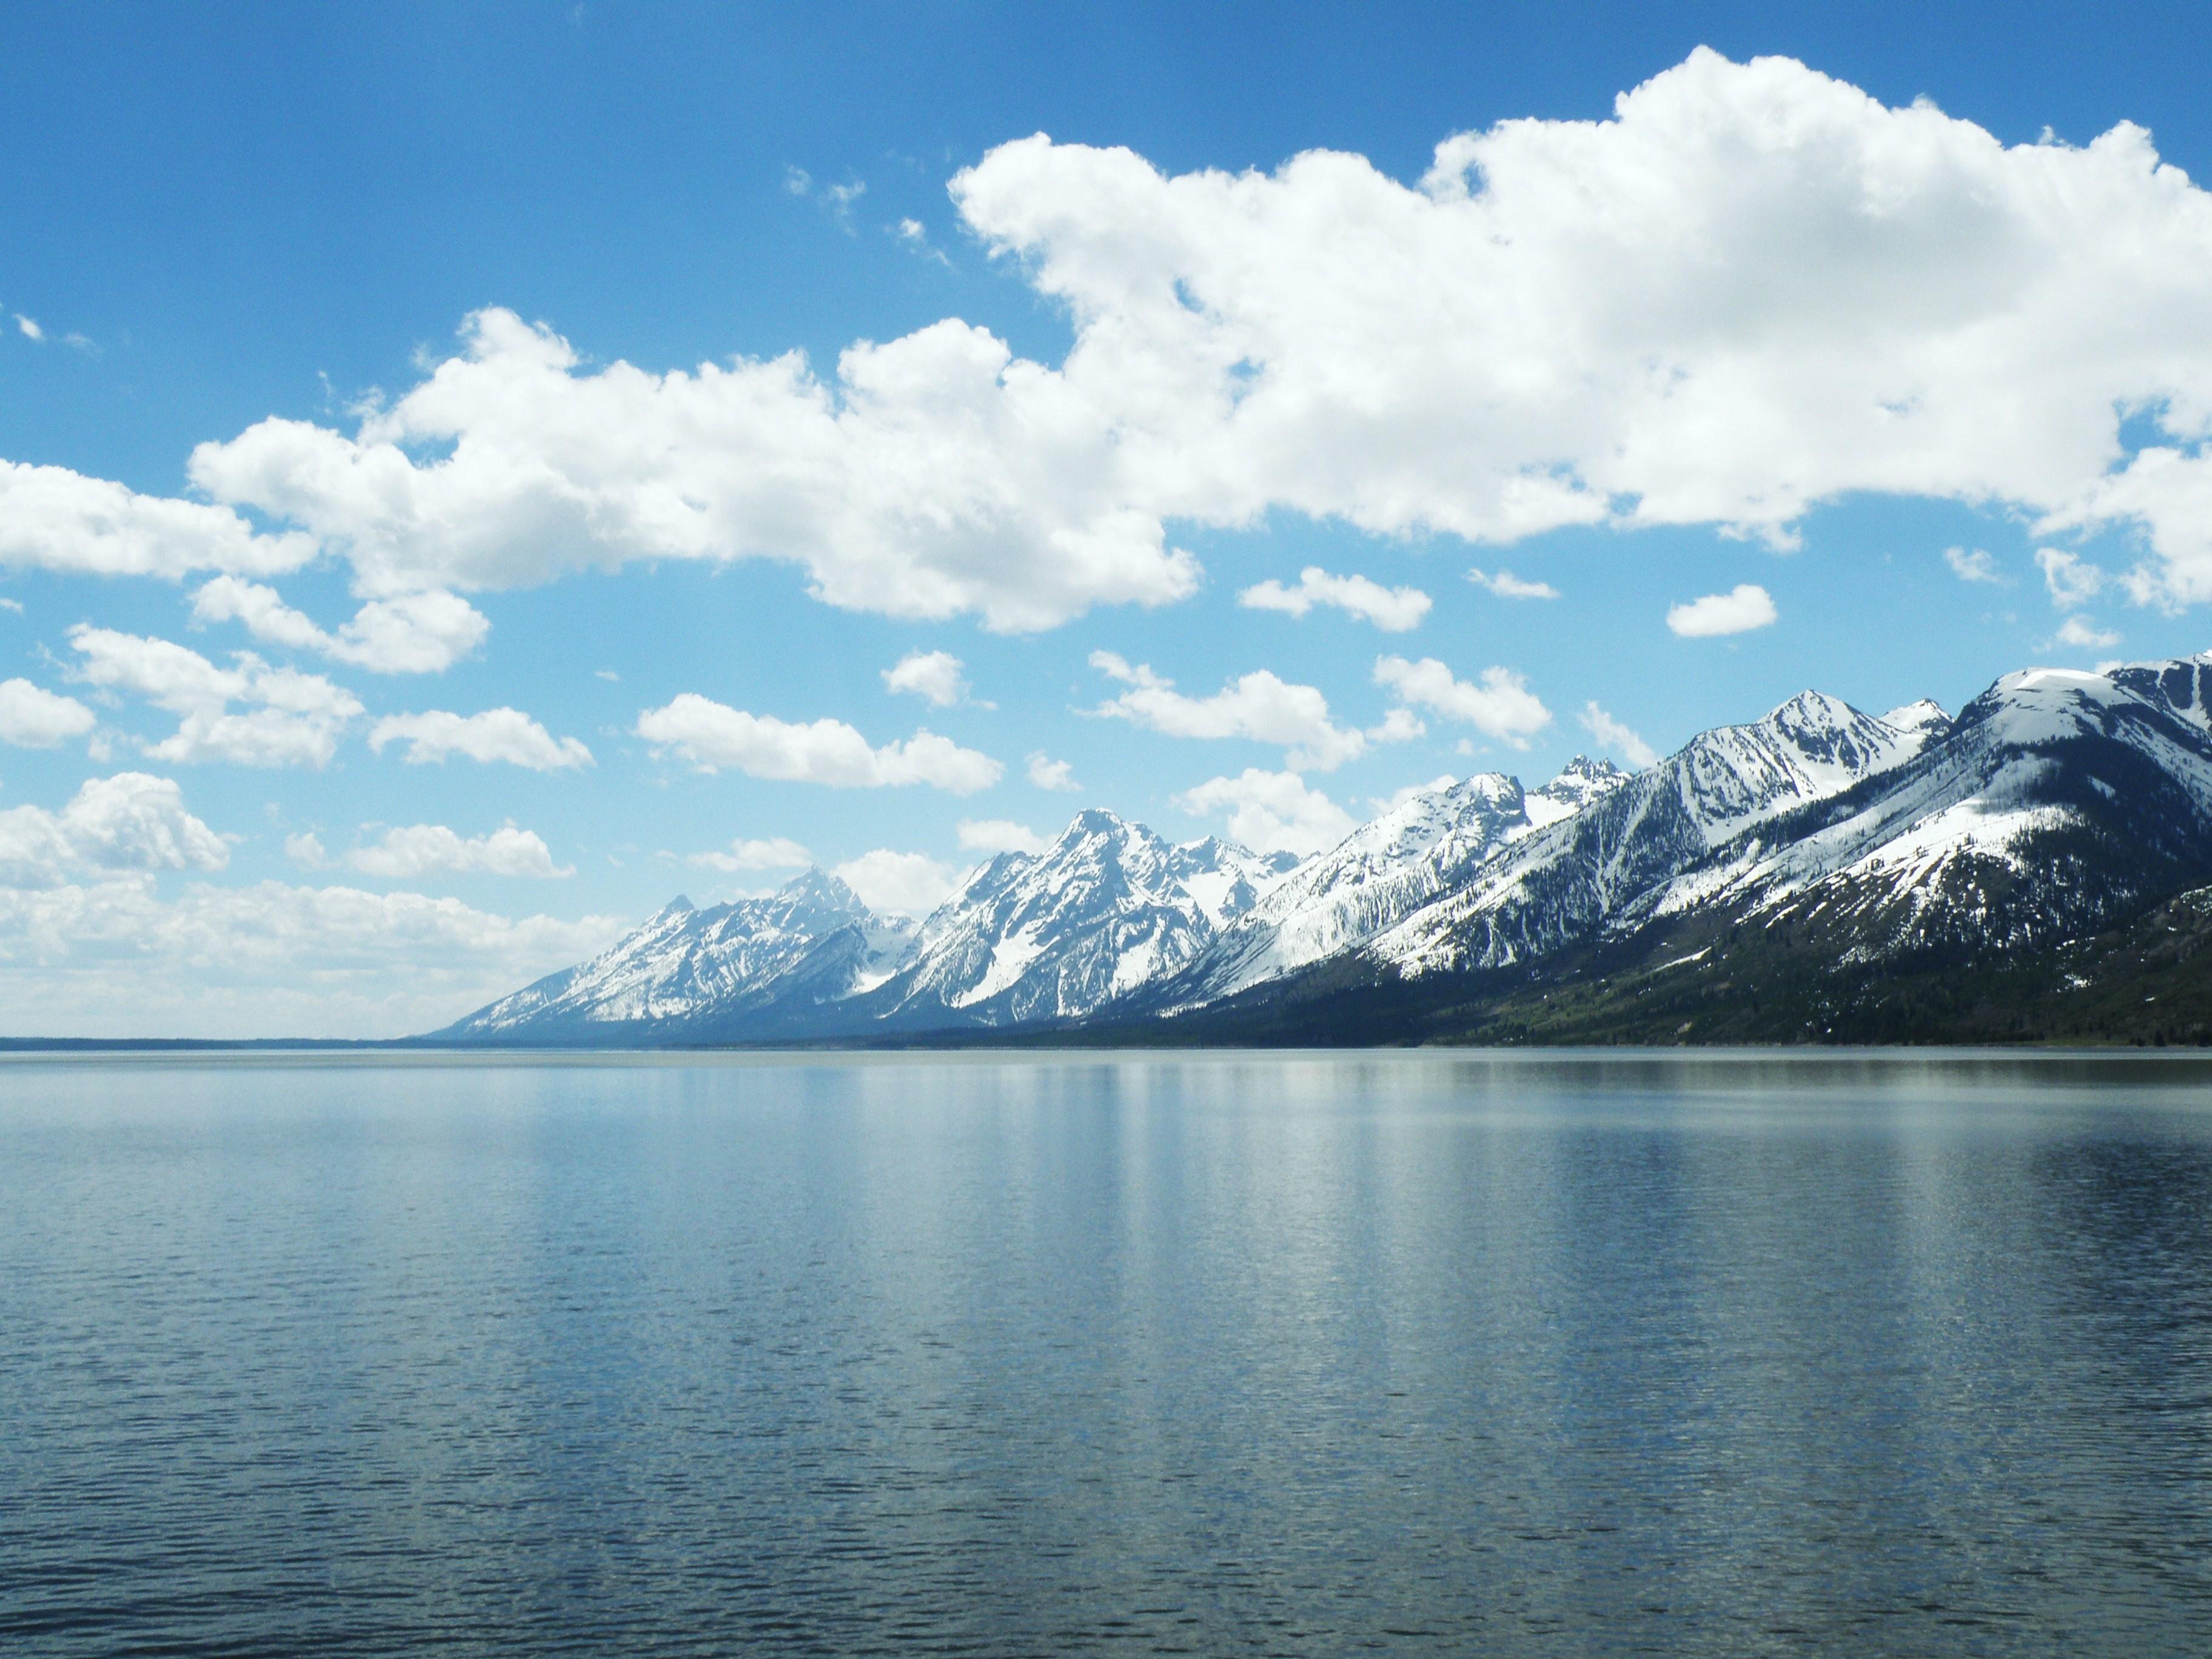 Pegunungan Teton Dari Seberang Danau Jackson